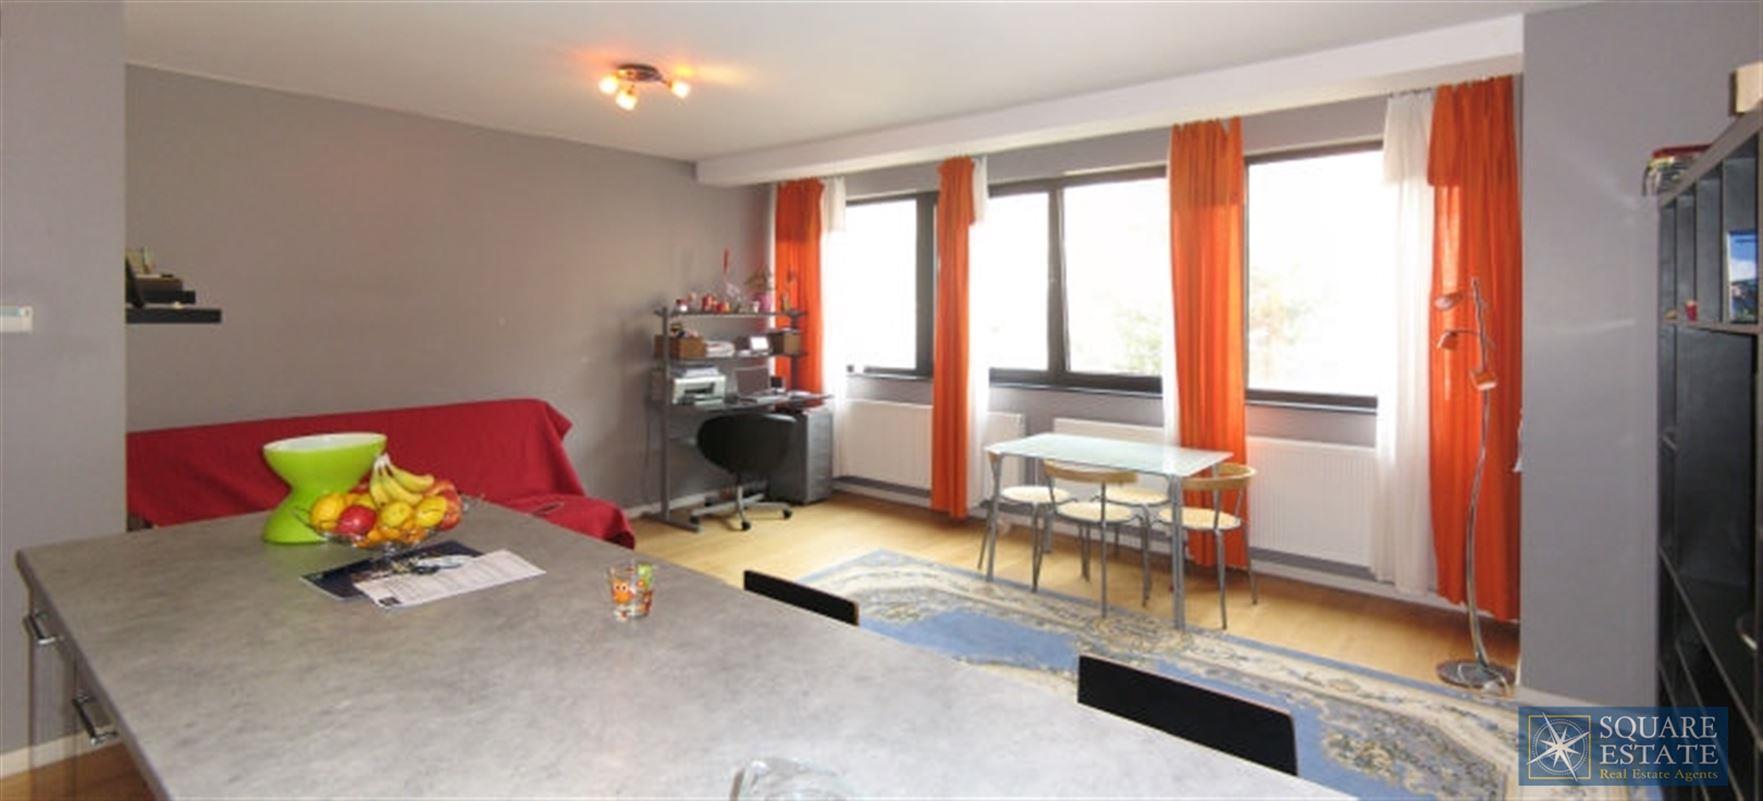 Foto 1 : Appartement te 1090 JETTE (België) - Prijs € 850